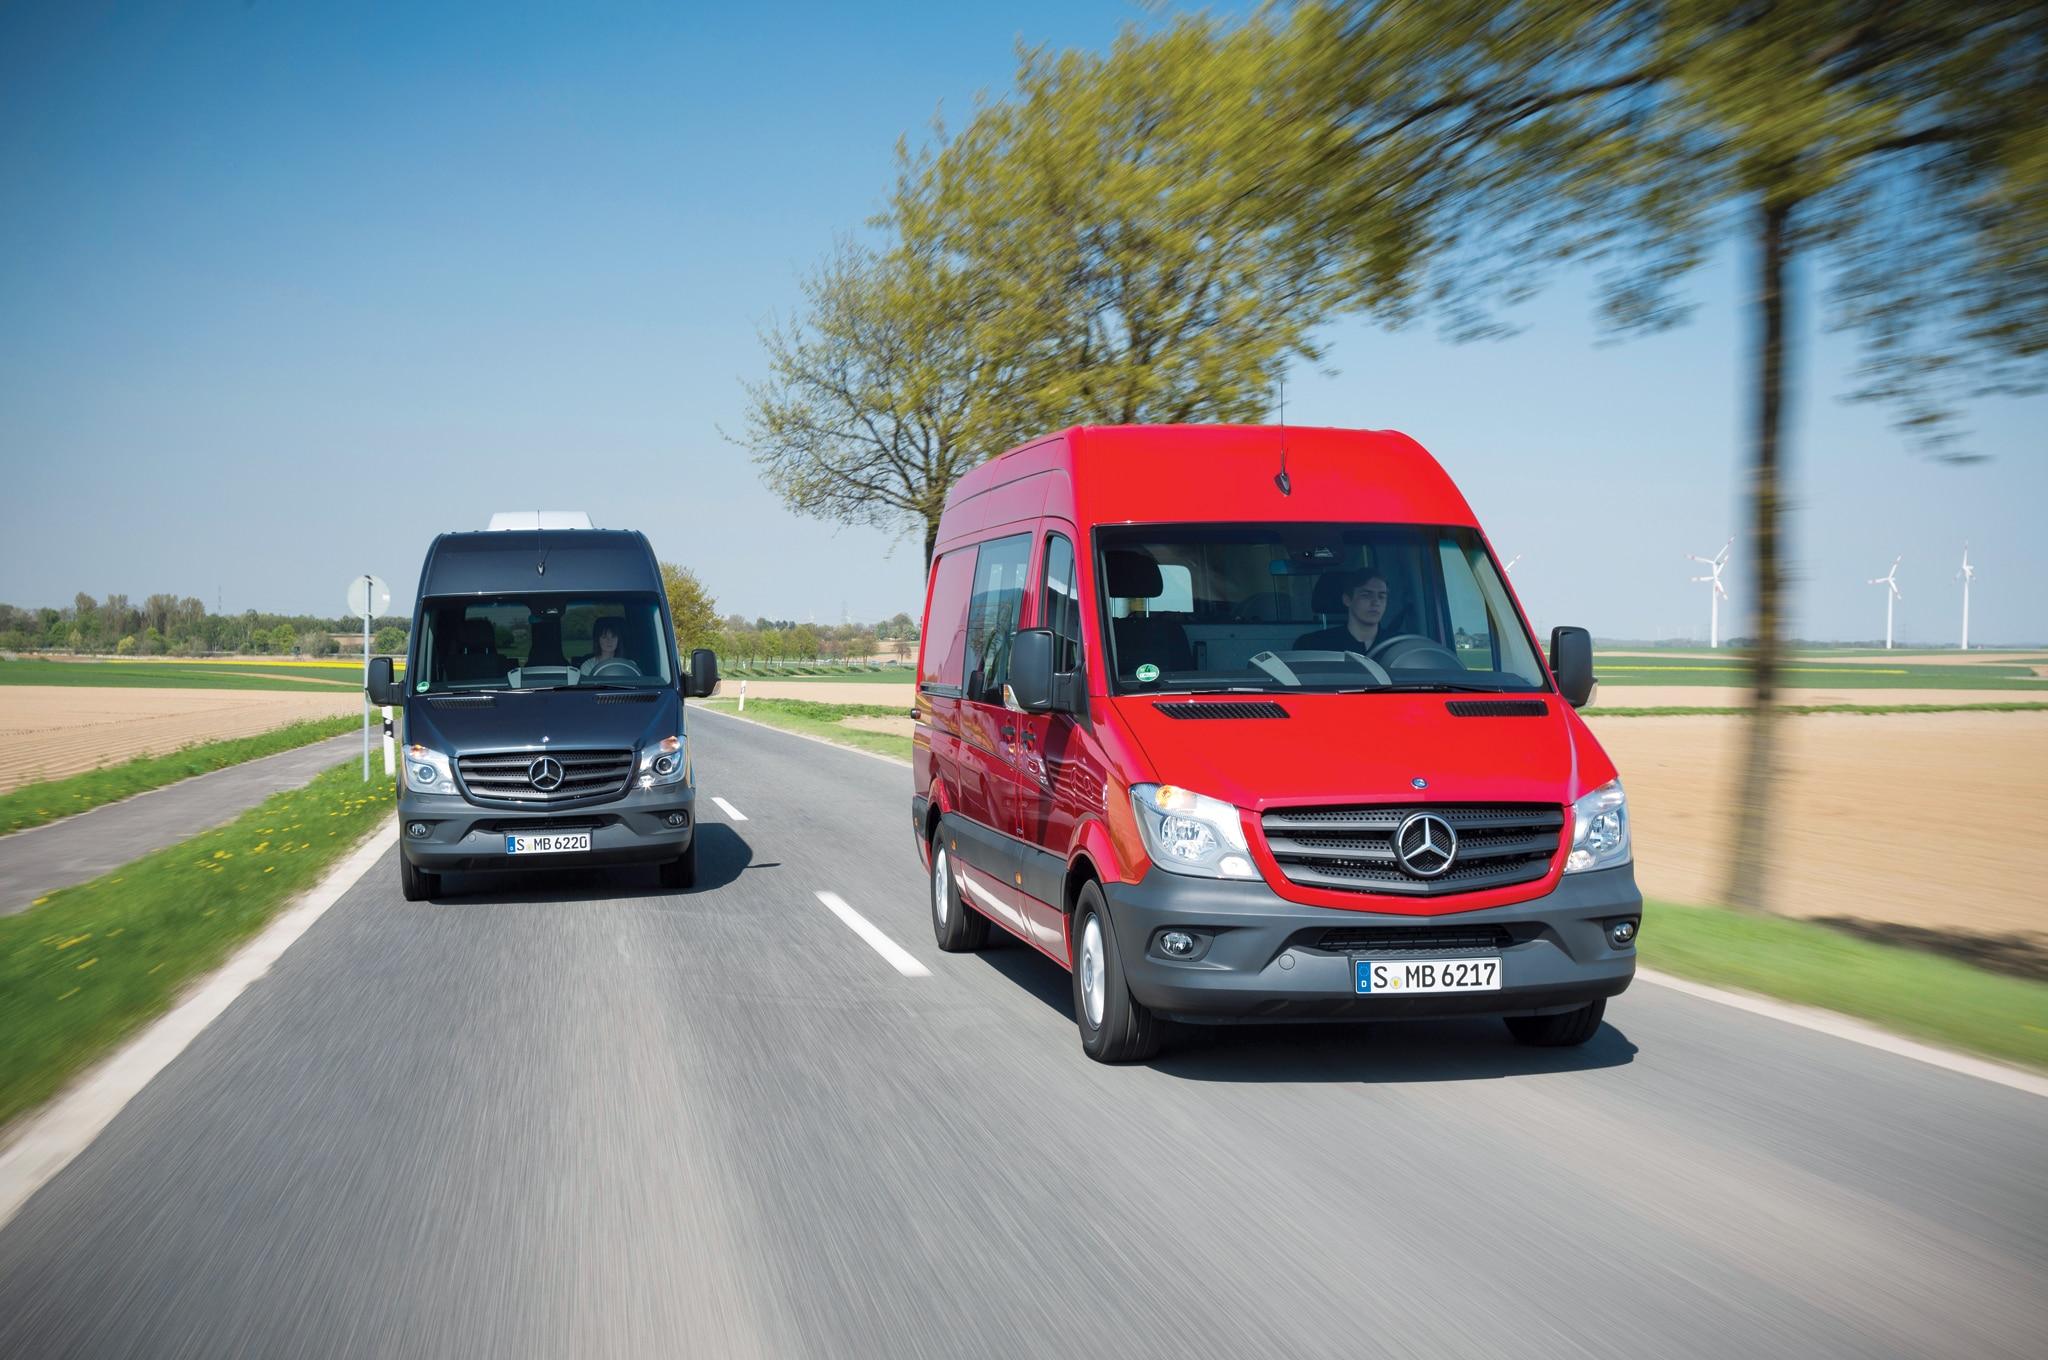 2014 Mercedes Benz Sprinter Front End In Motion 04